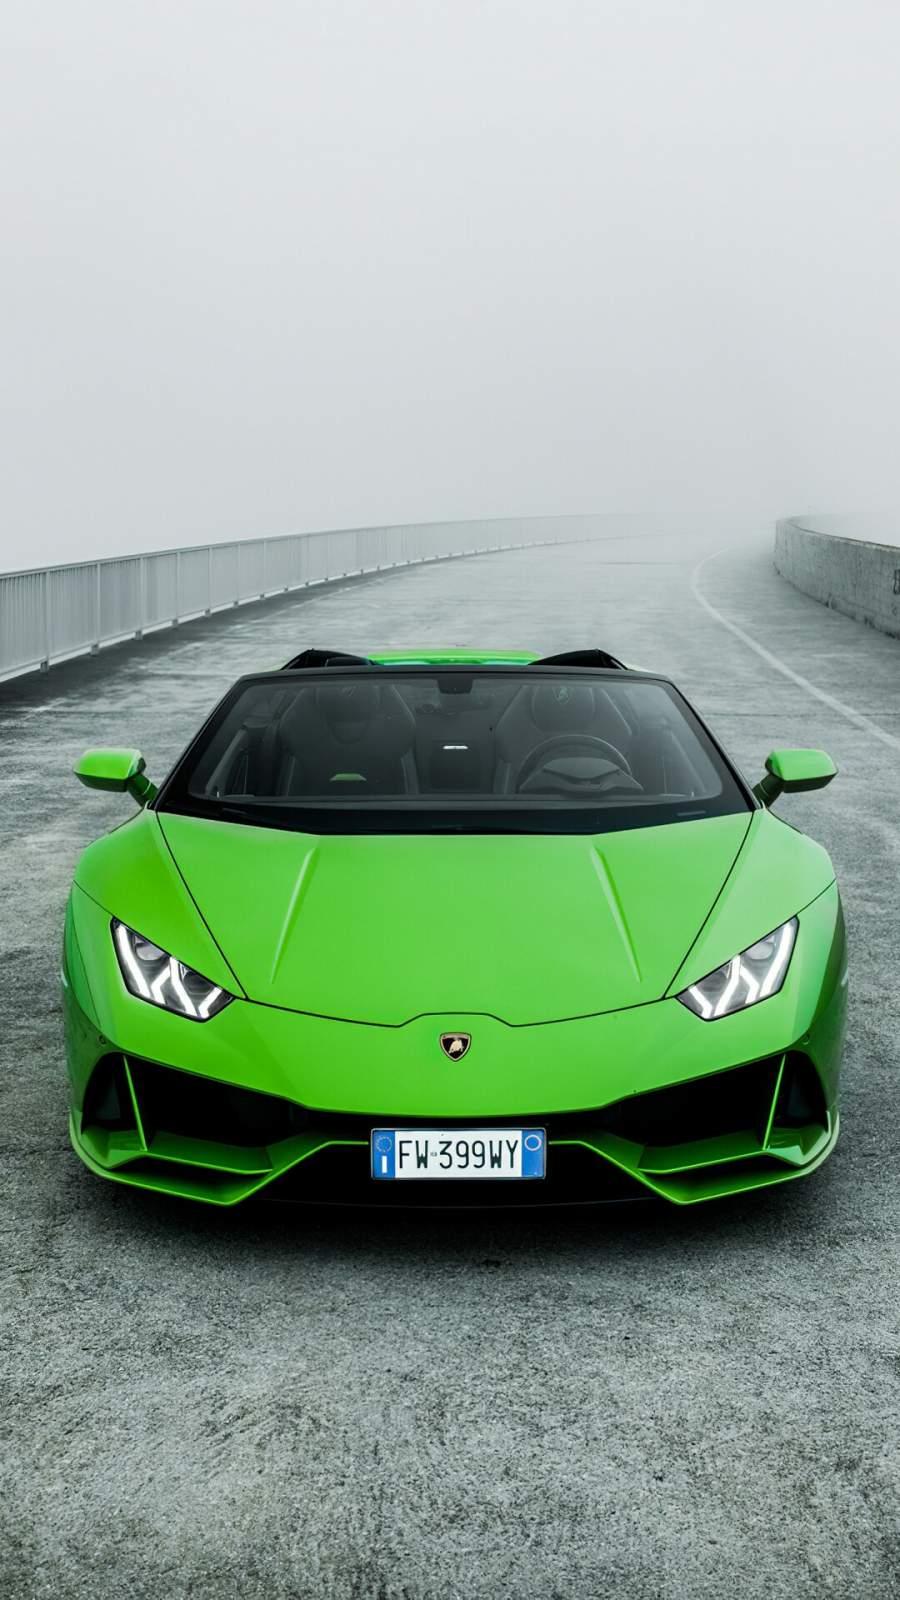 Lamborghini Huracan Evo Spyder iPhone Wallpaper